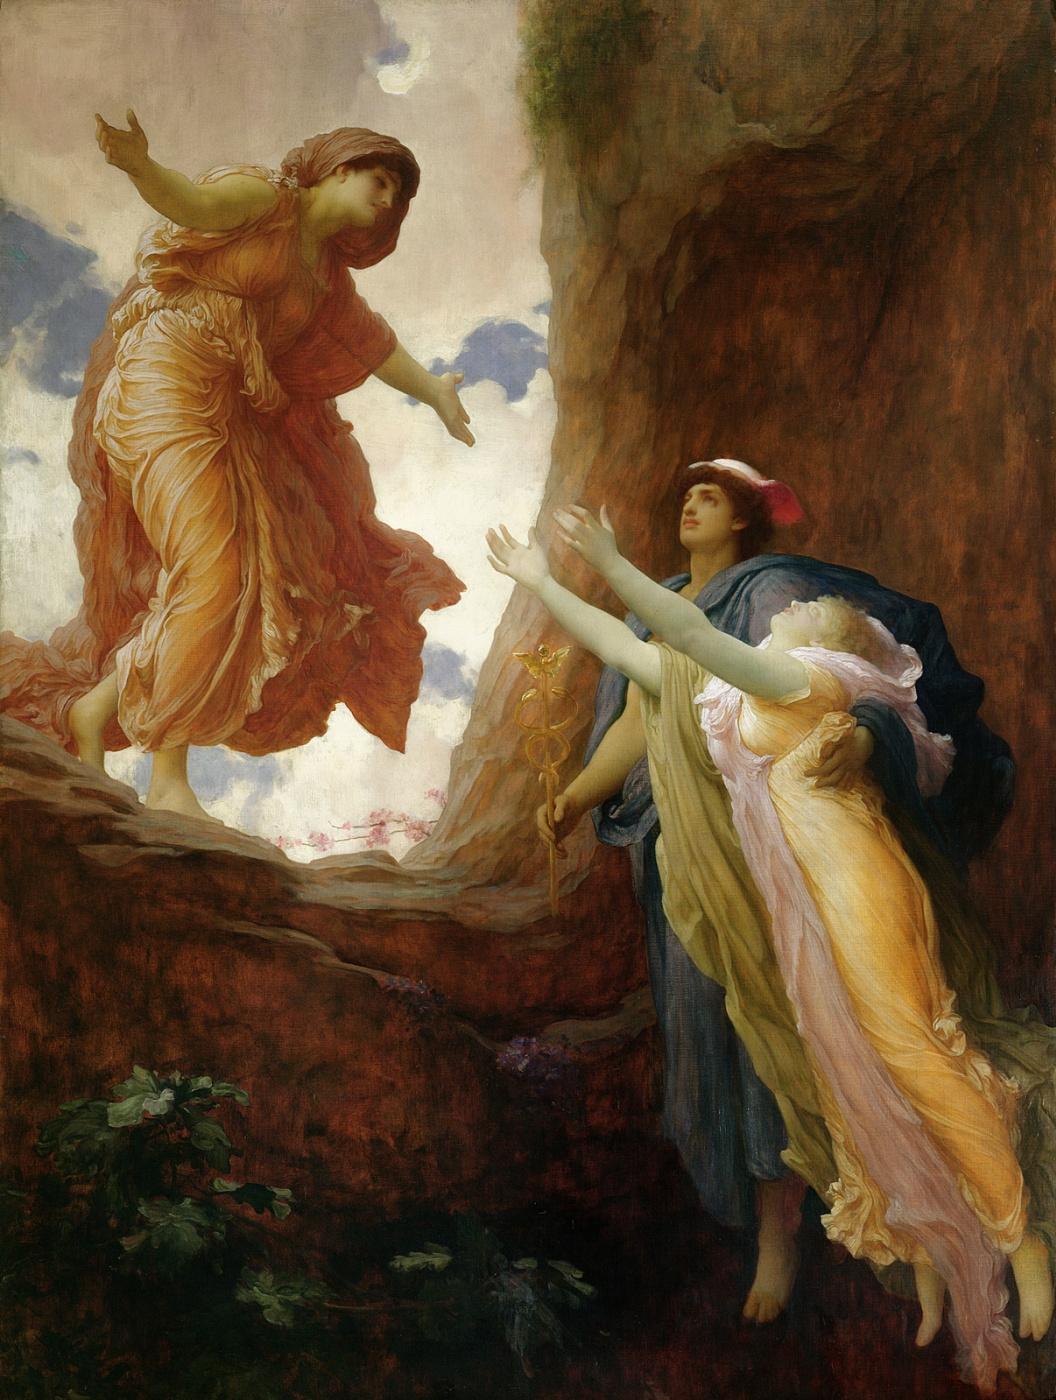 Frederic_Leighton_-_The_Return_of_Persephone_(1891)